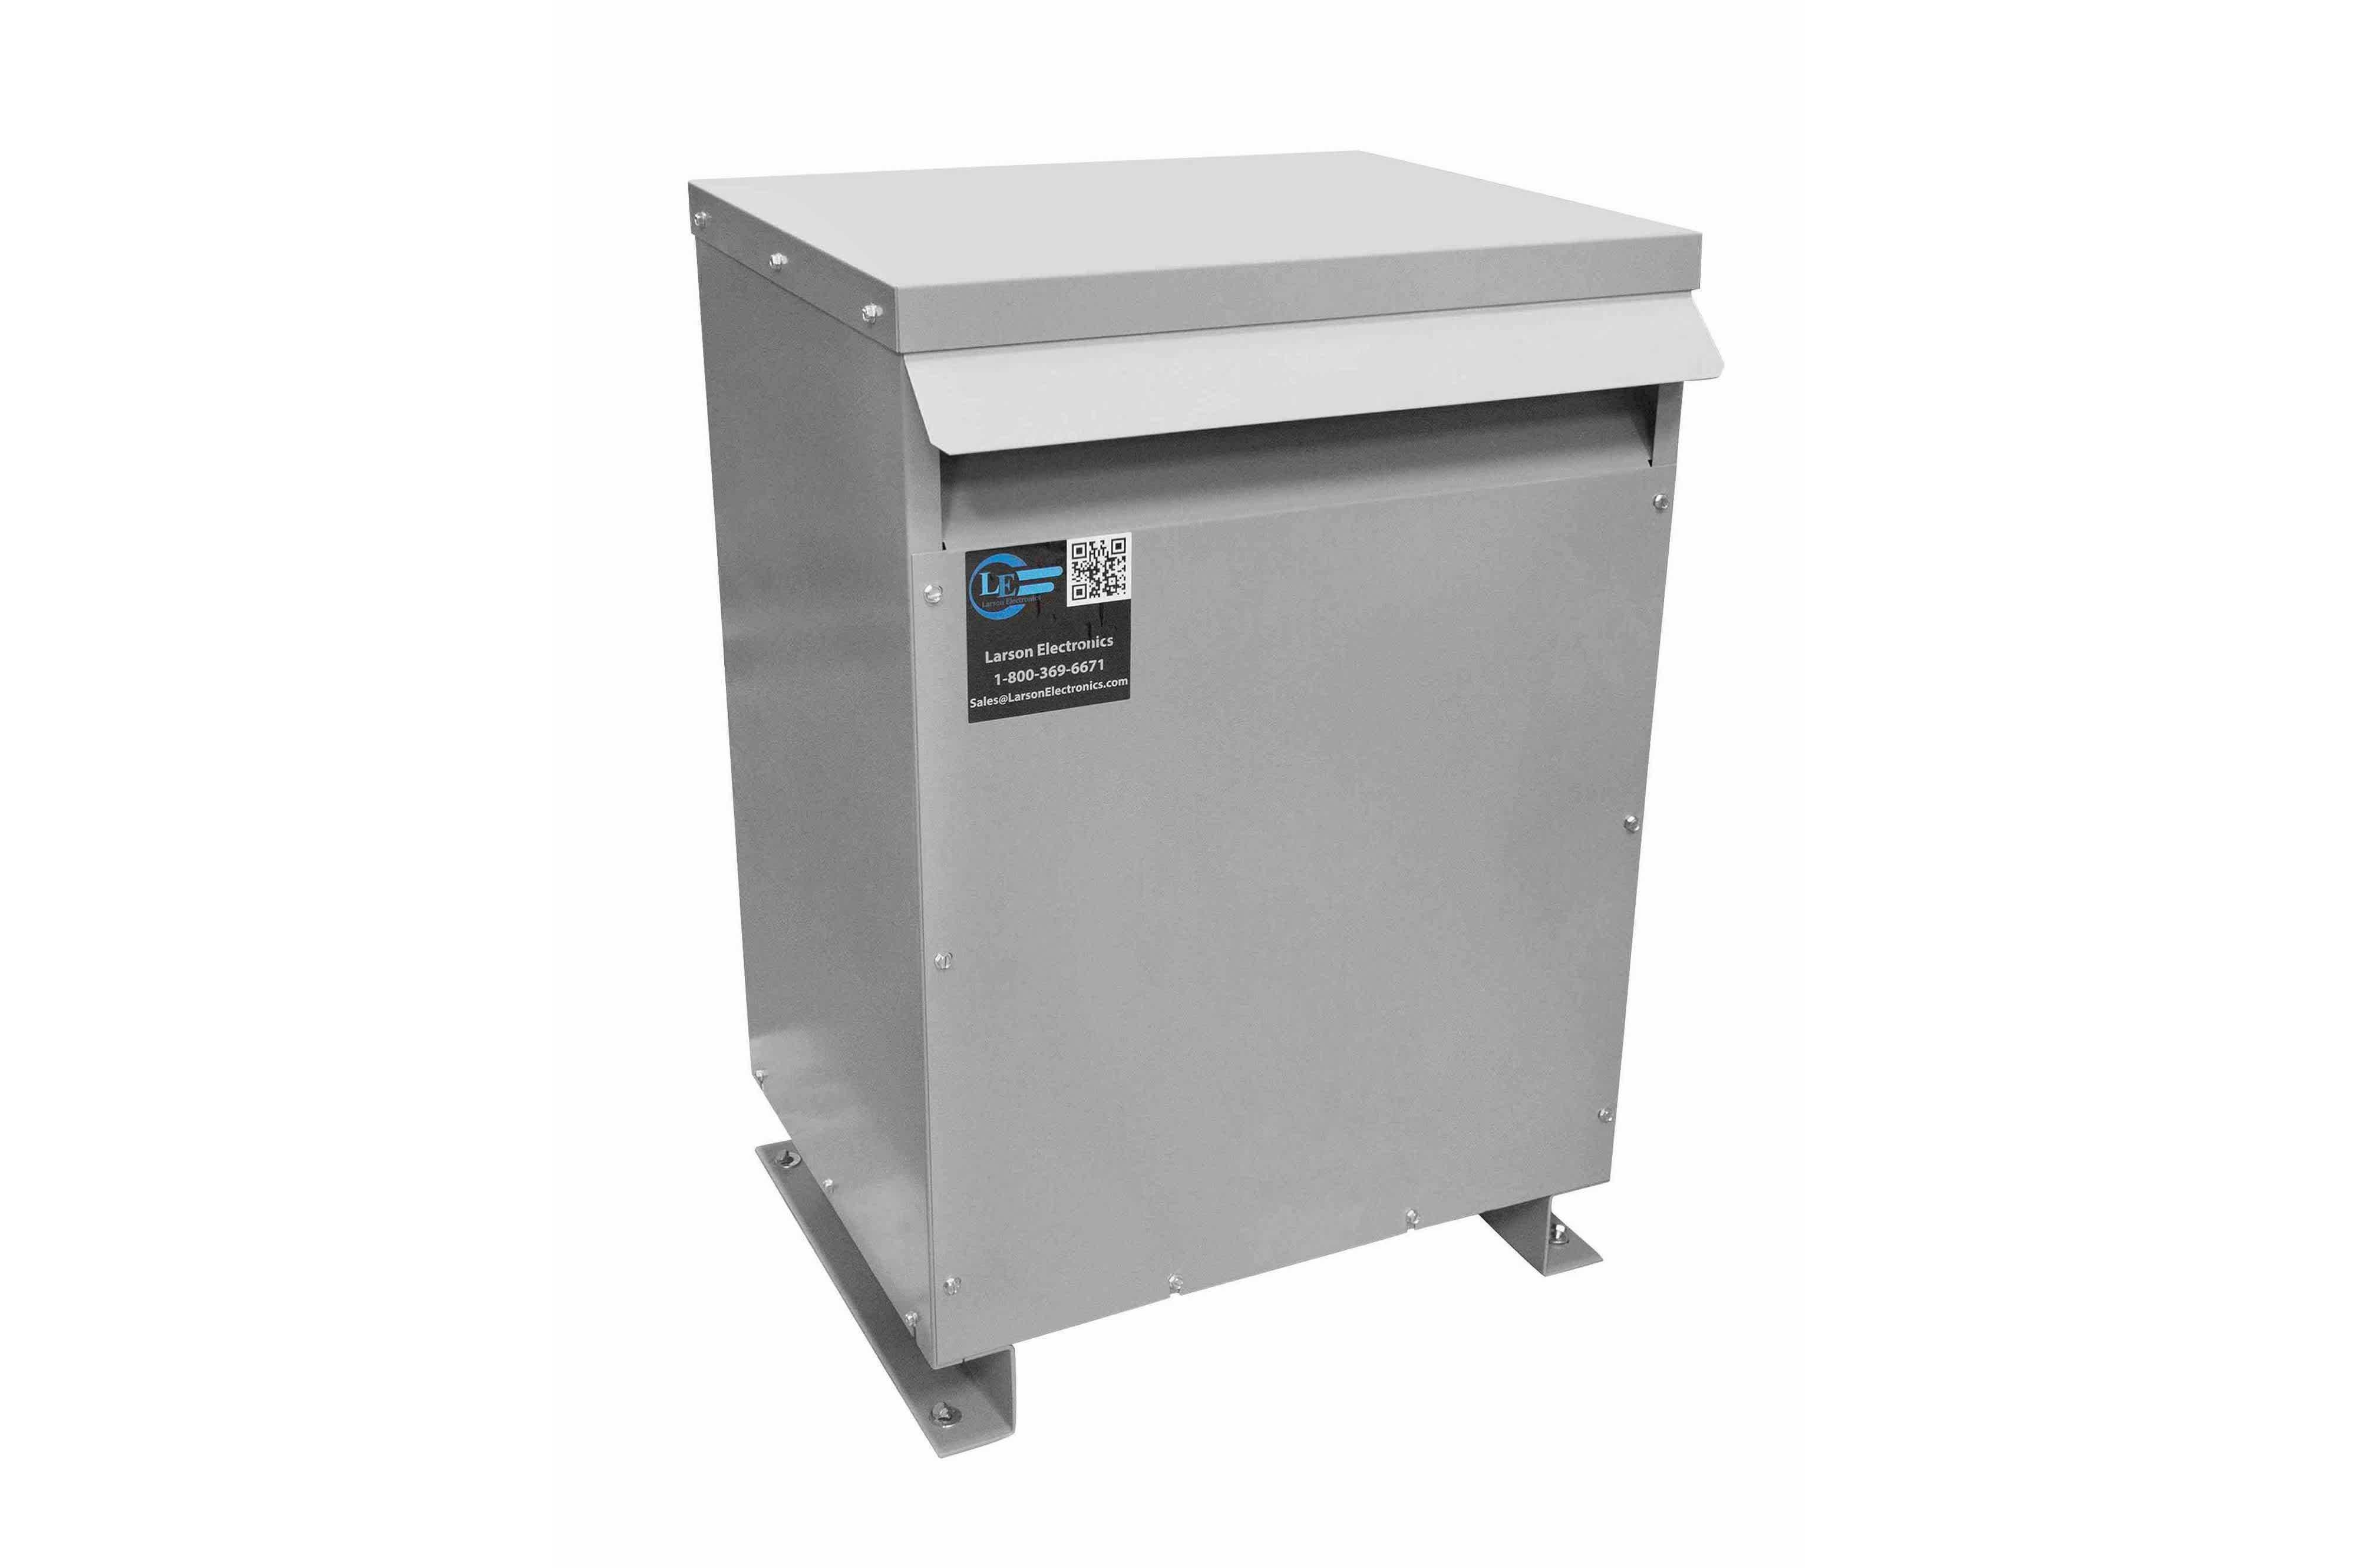 500 kVA 3PH Isolation Transformer, 240V Wye Primary, 380Y/220 Wye-N Secondary, N3R, Ventilated, 60 Hz